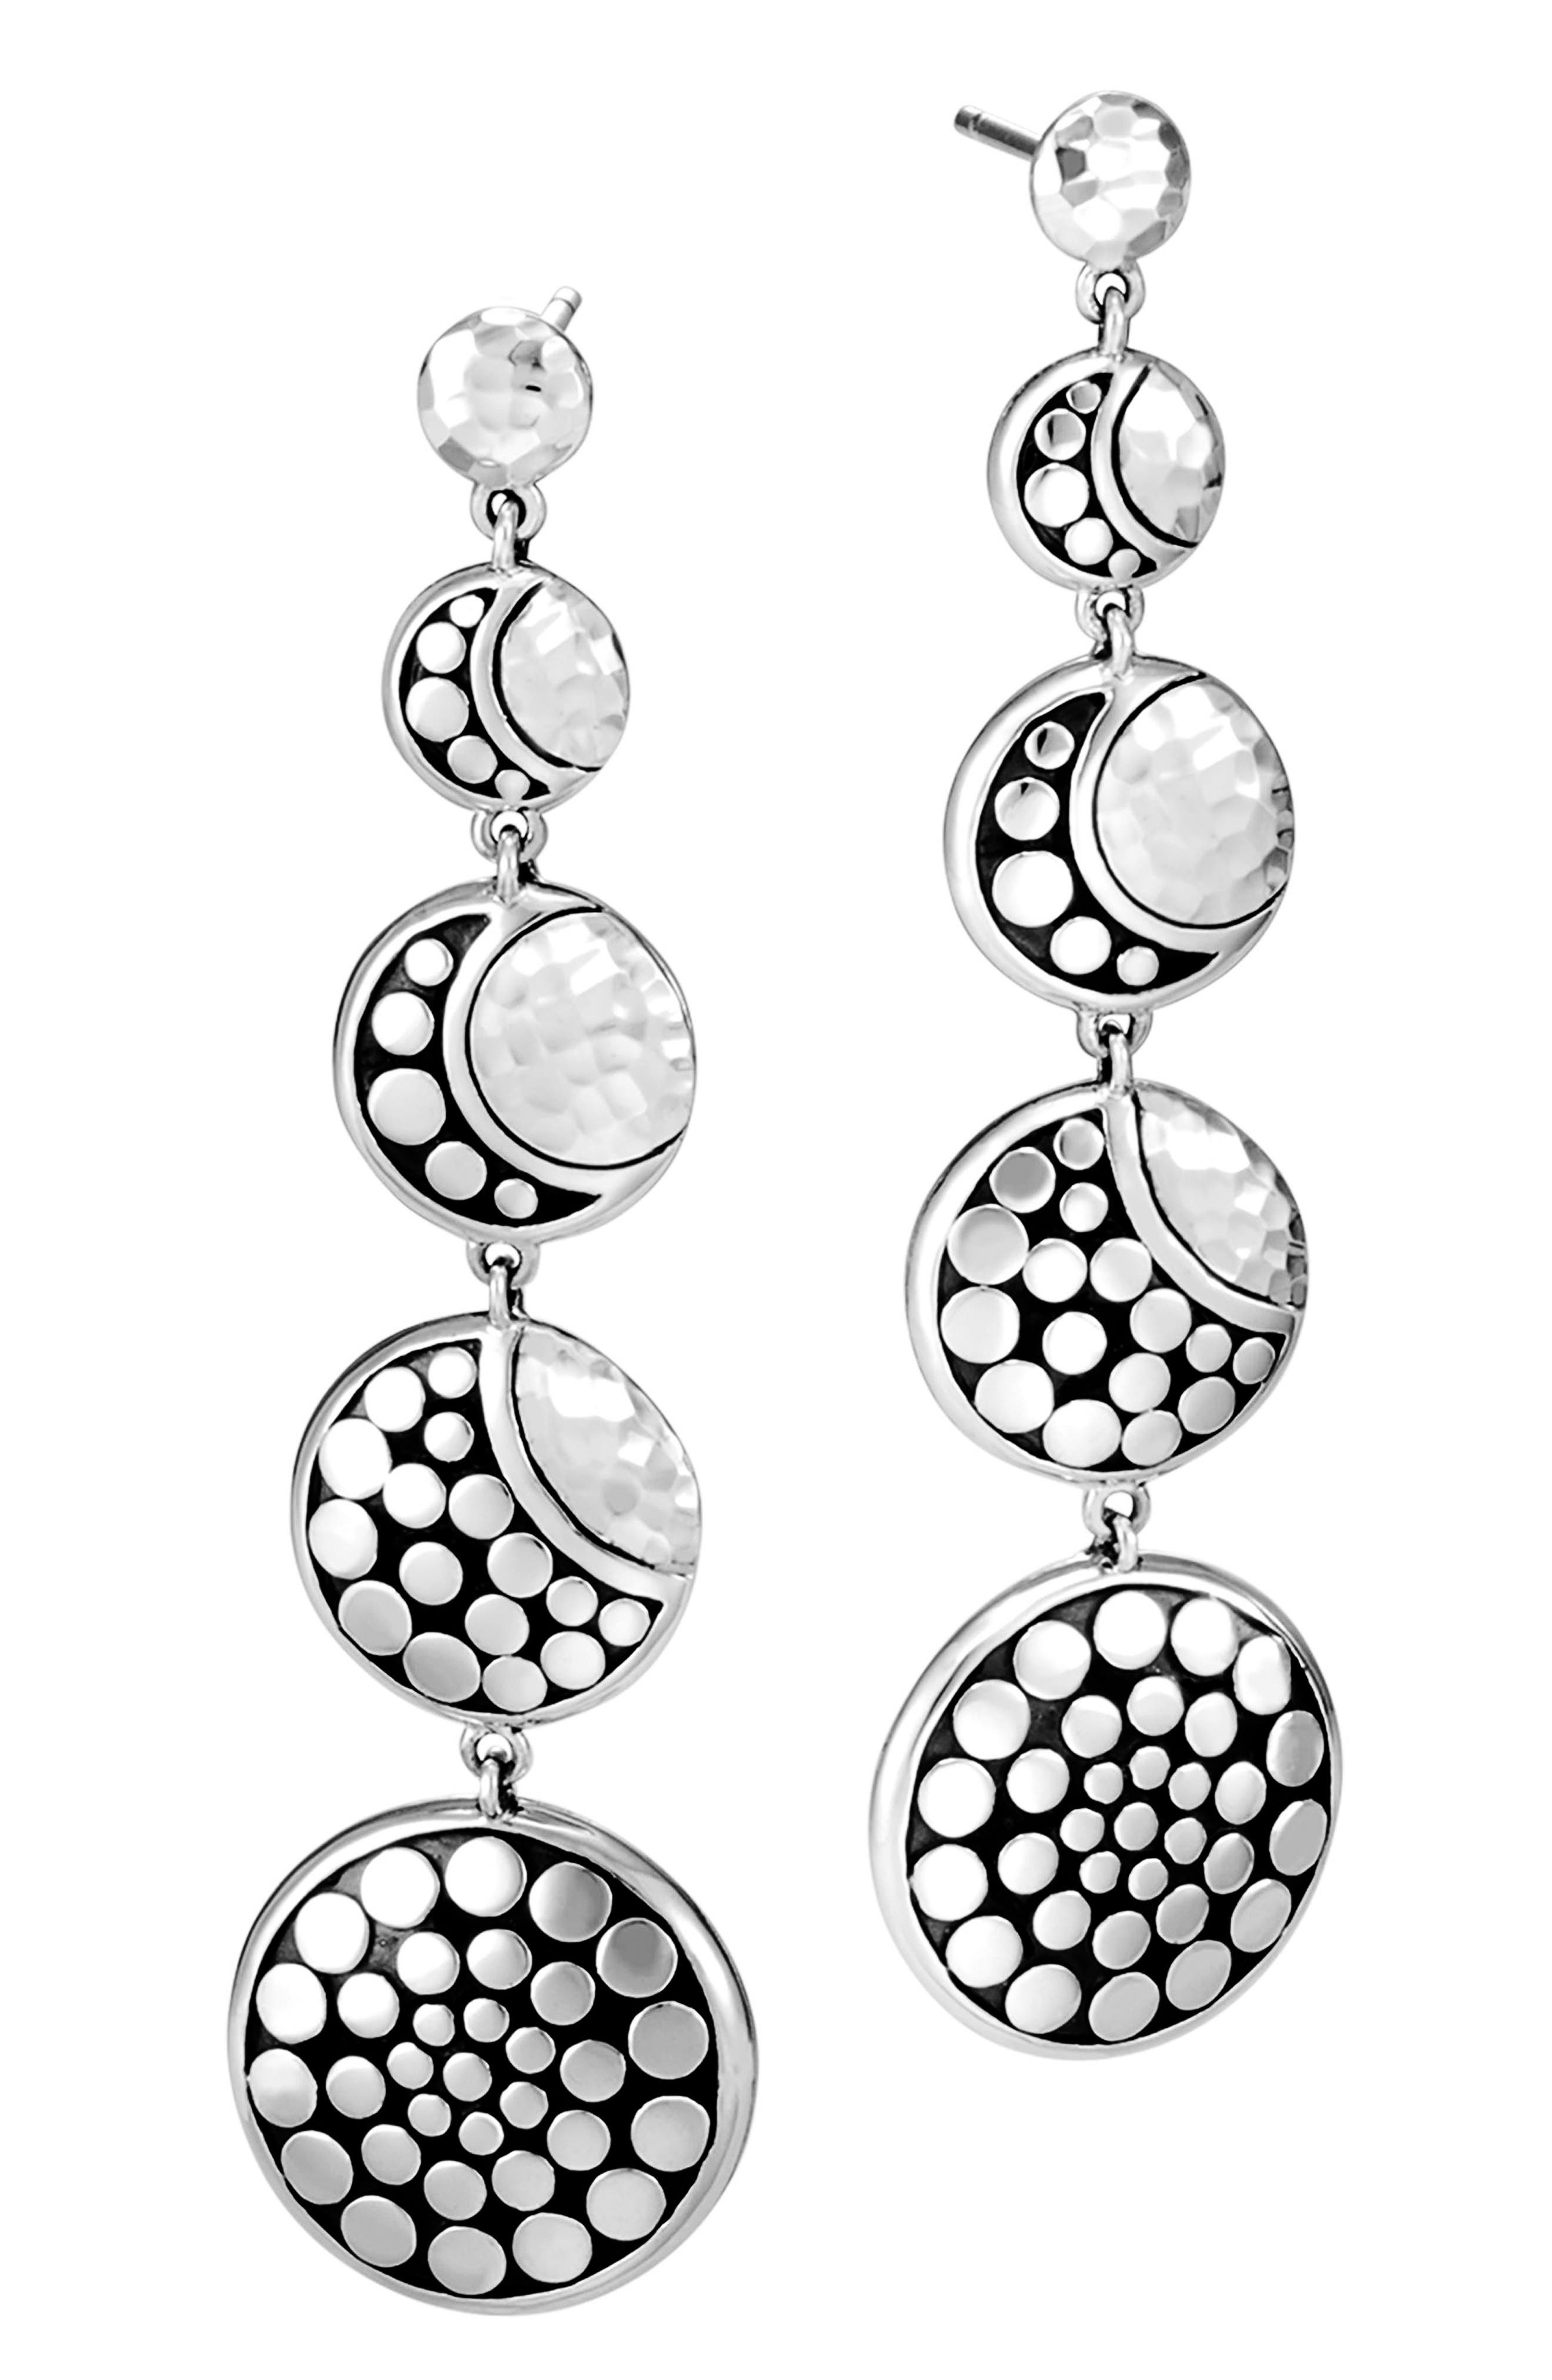 Dot Hammered Drop Earrings,                             Main thumbnail 1, color,                             Silver